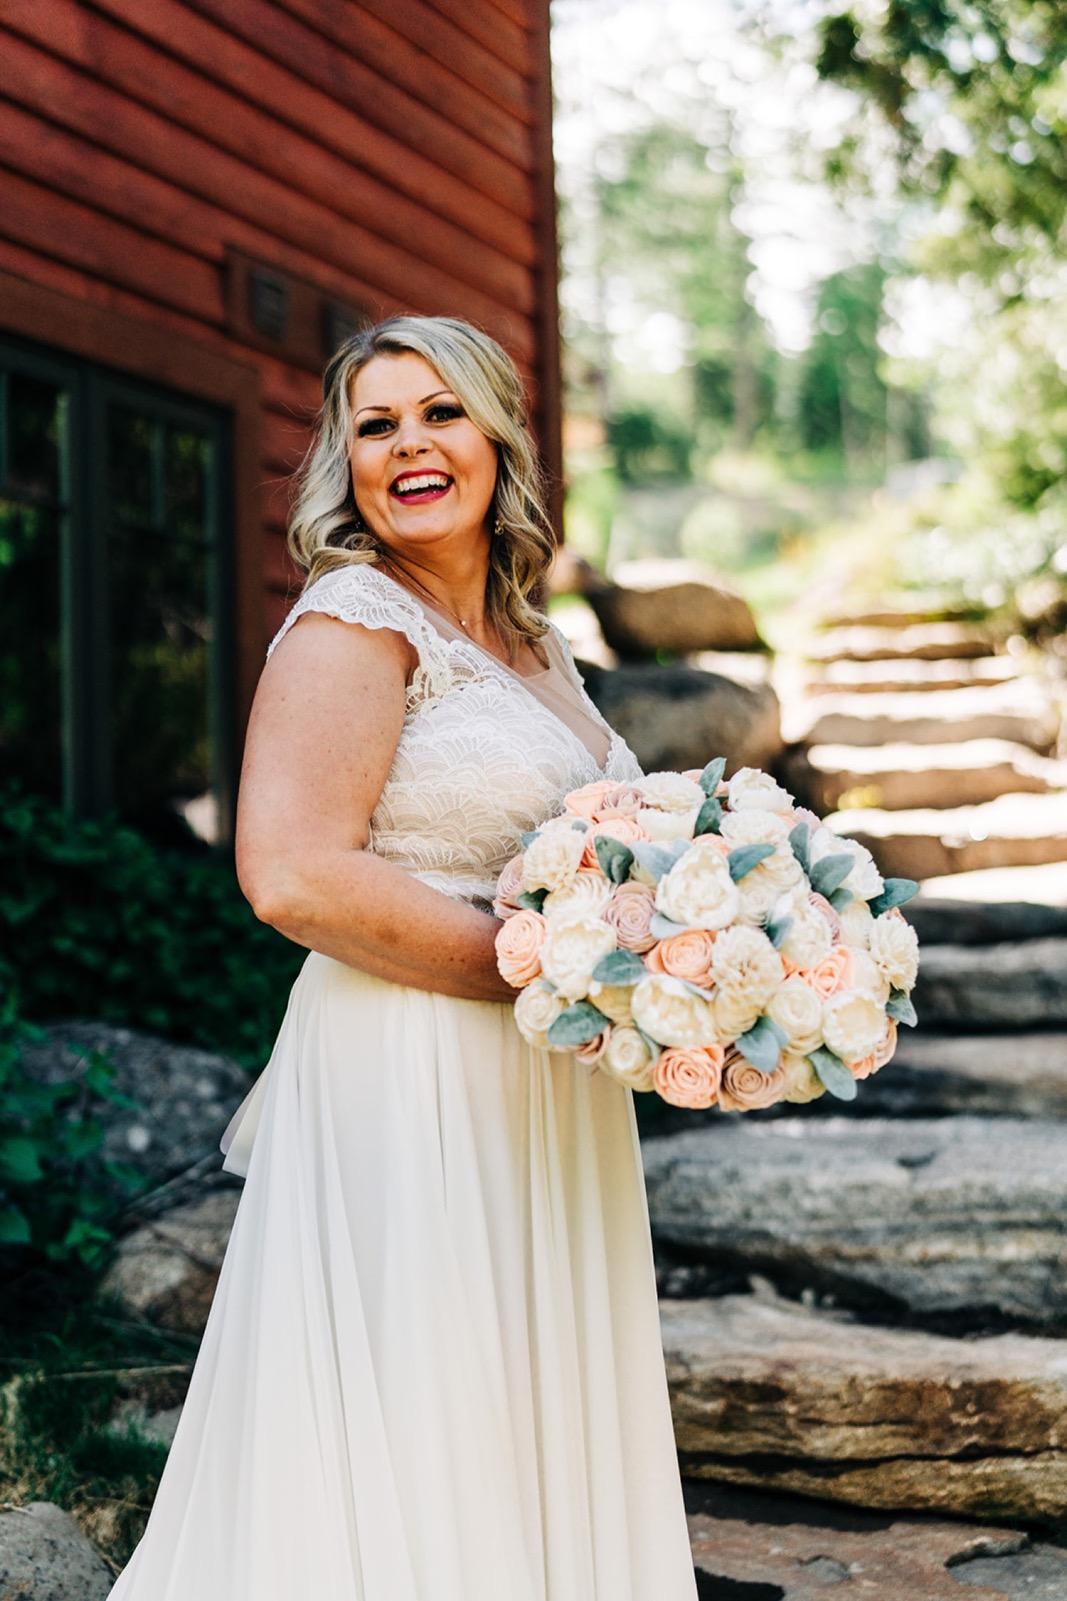 038_falissa_heather_wedding-108.jpg